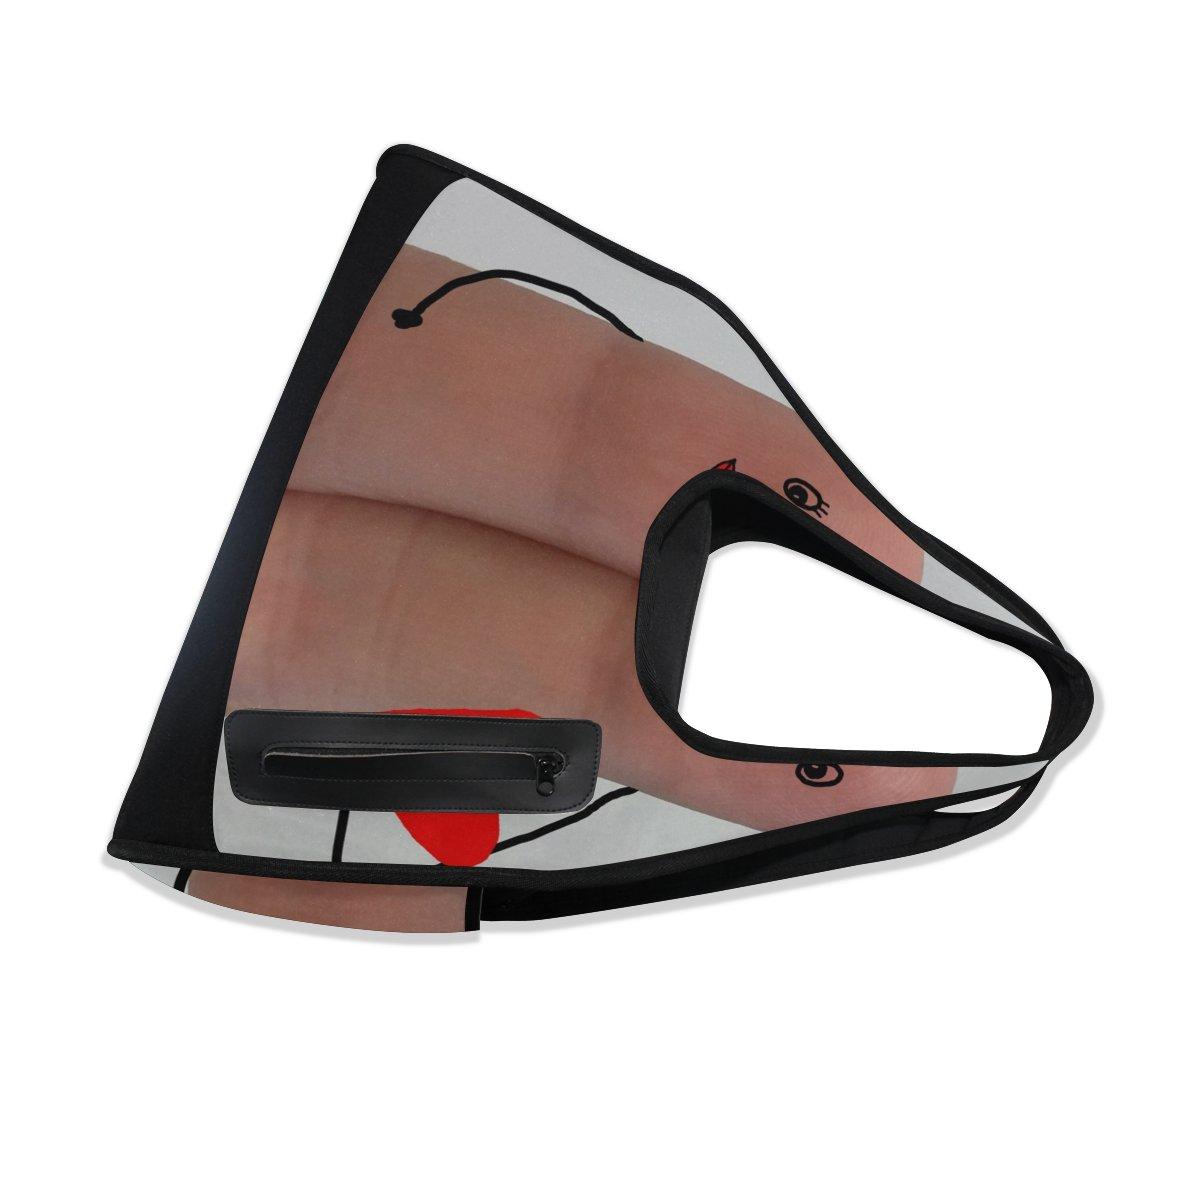 AHOMY Sports Gym Bag Love Marriage Duffel Bag Travel Shoulder Bag by AHOMY (Image #6)